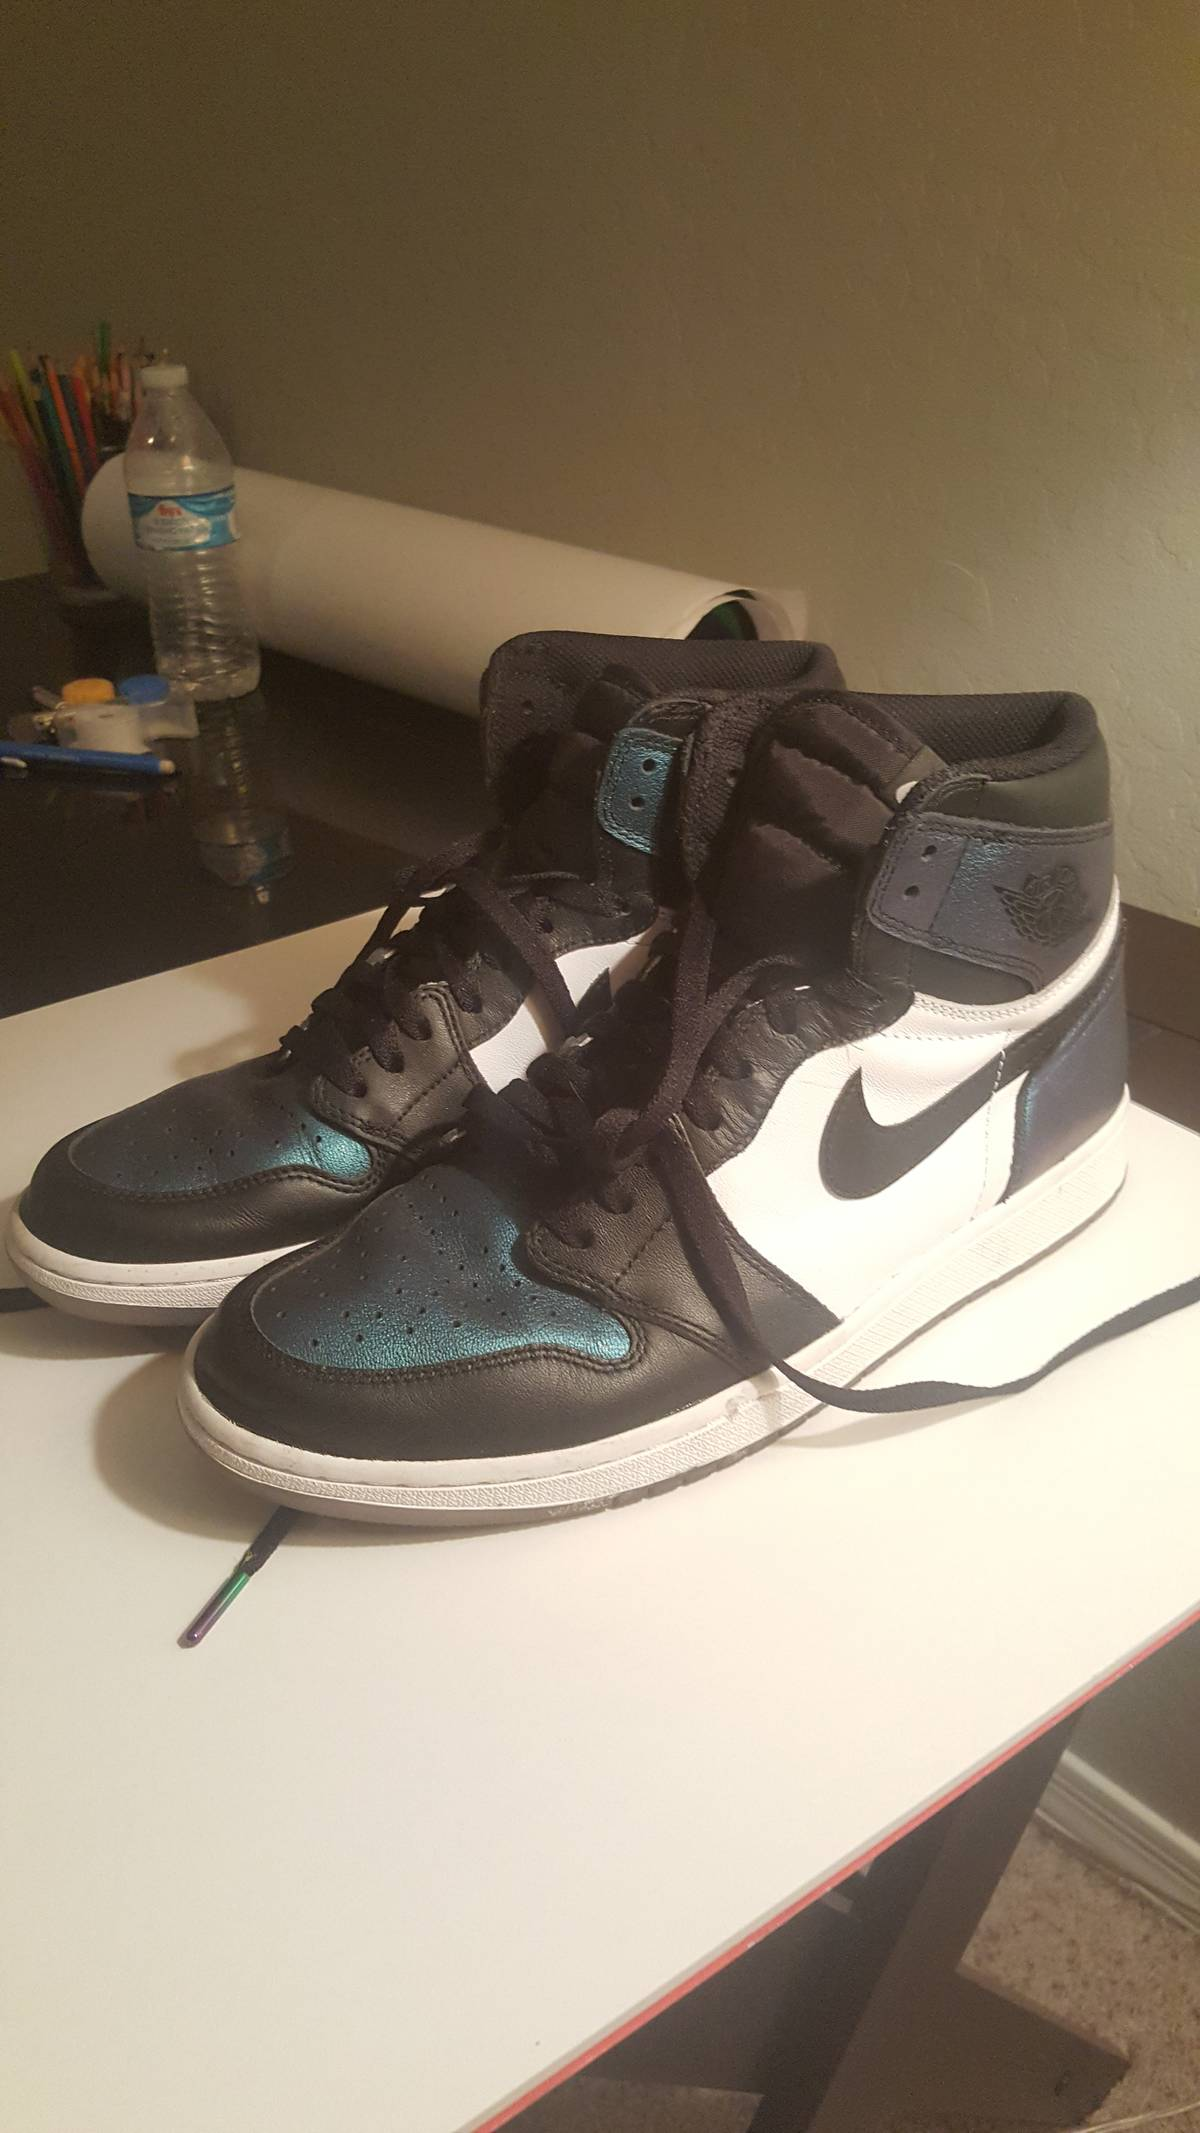 86df6b8e7057 Nike Air Jordan 1 Retro High OG